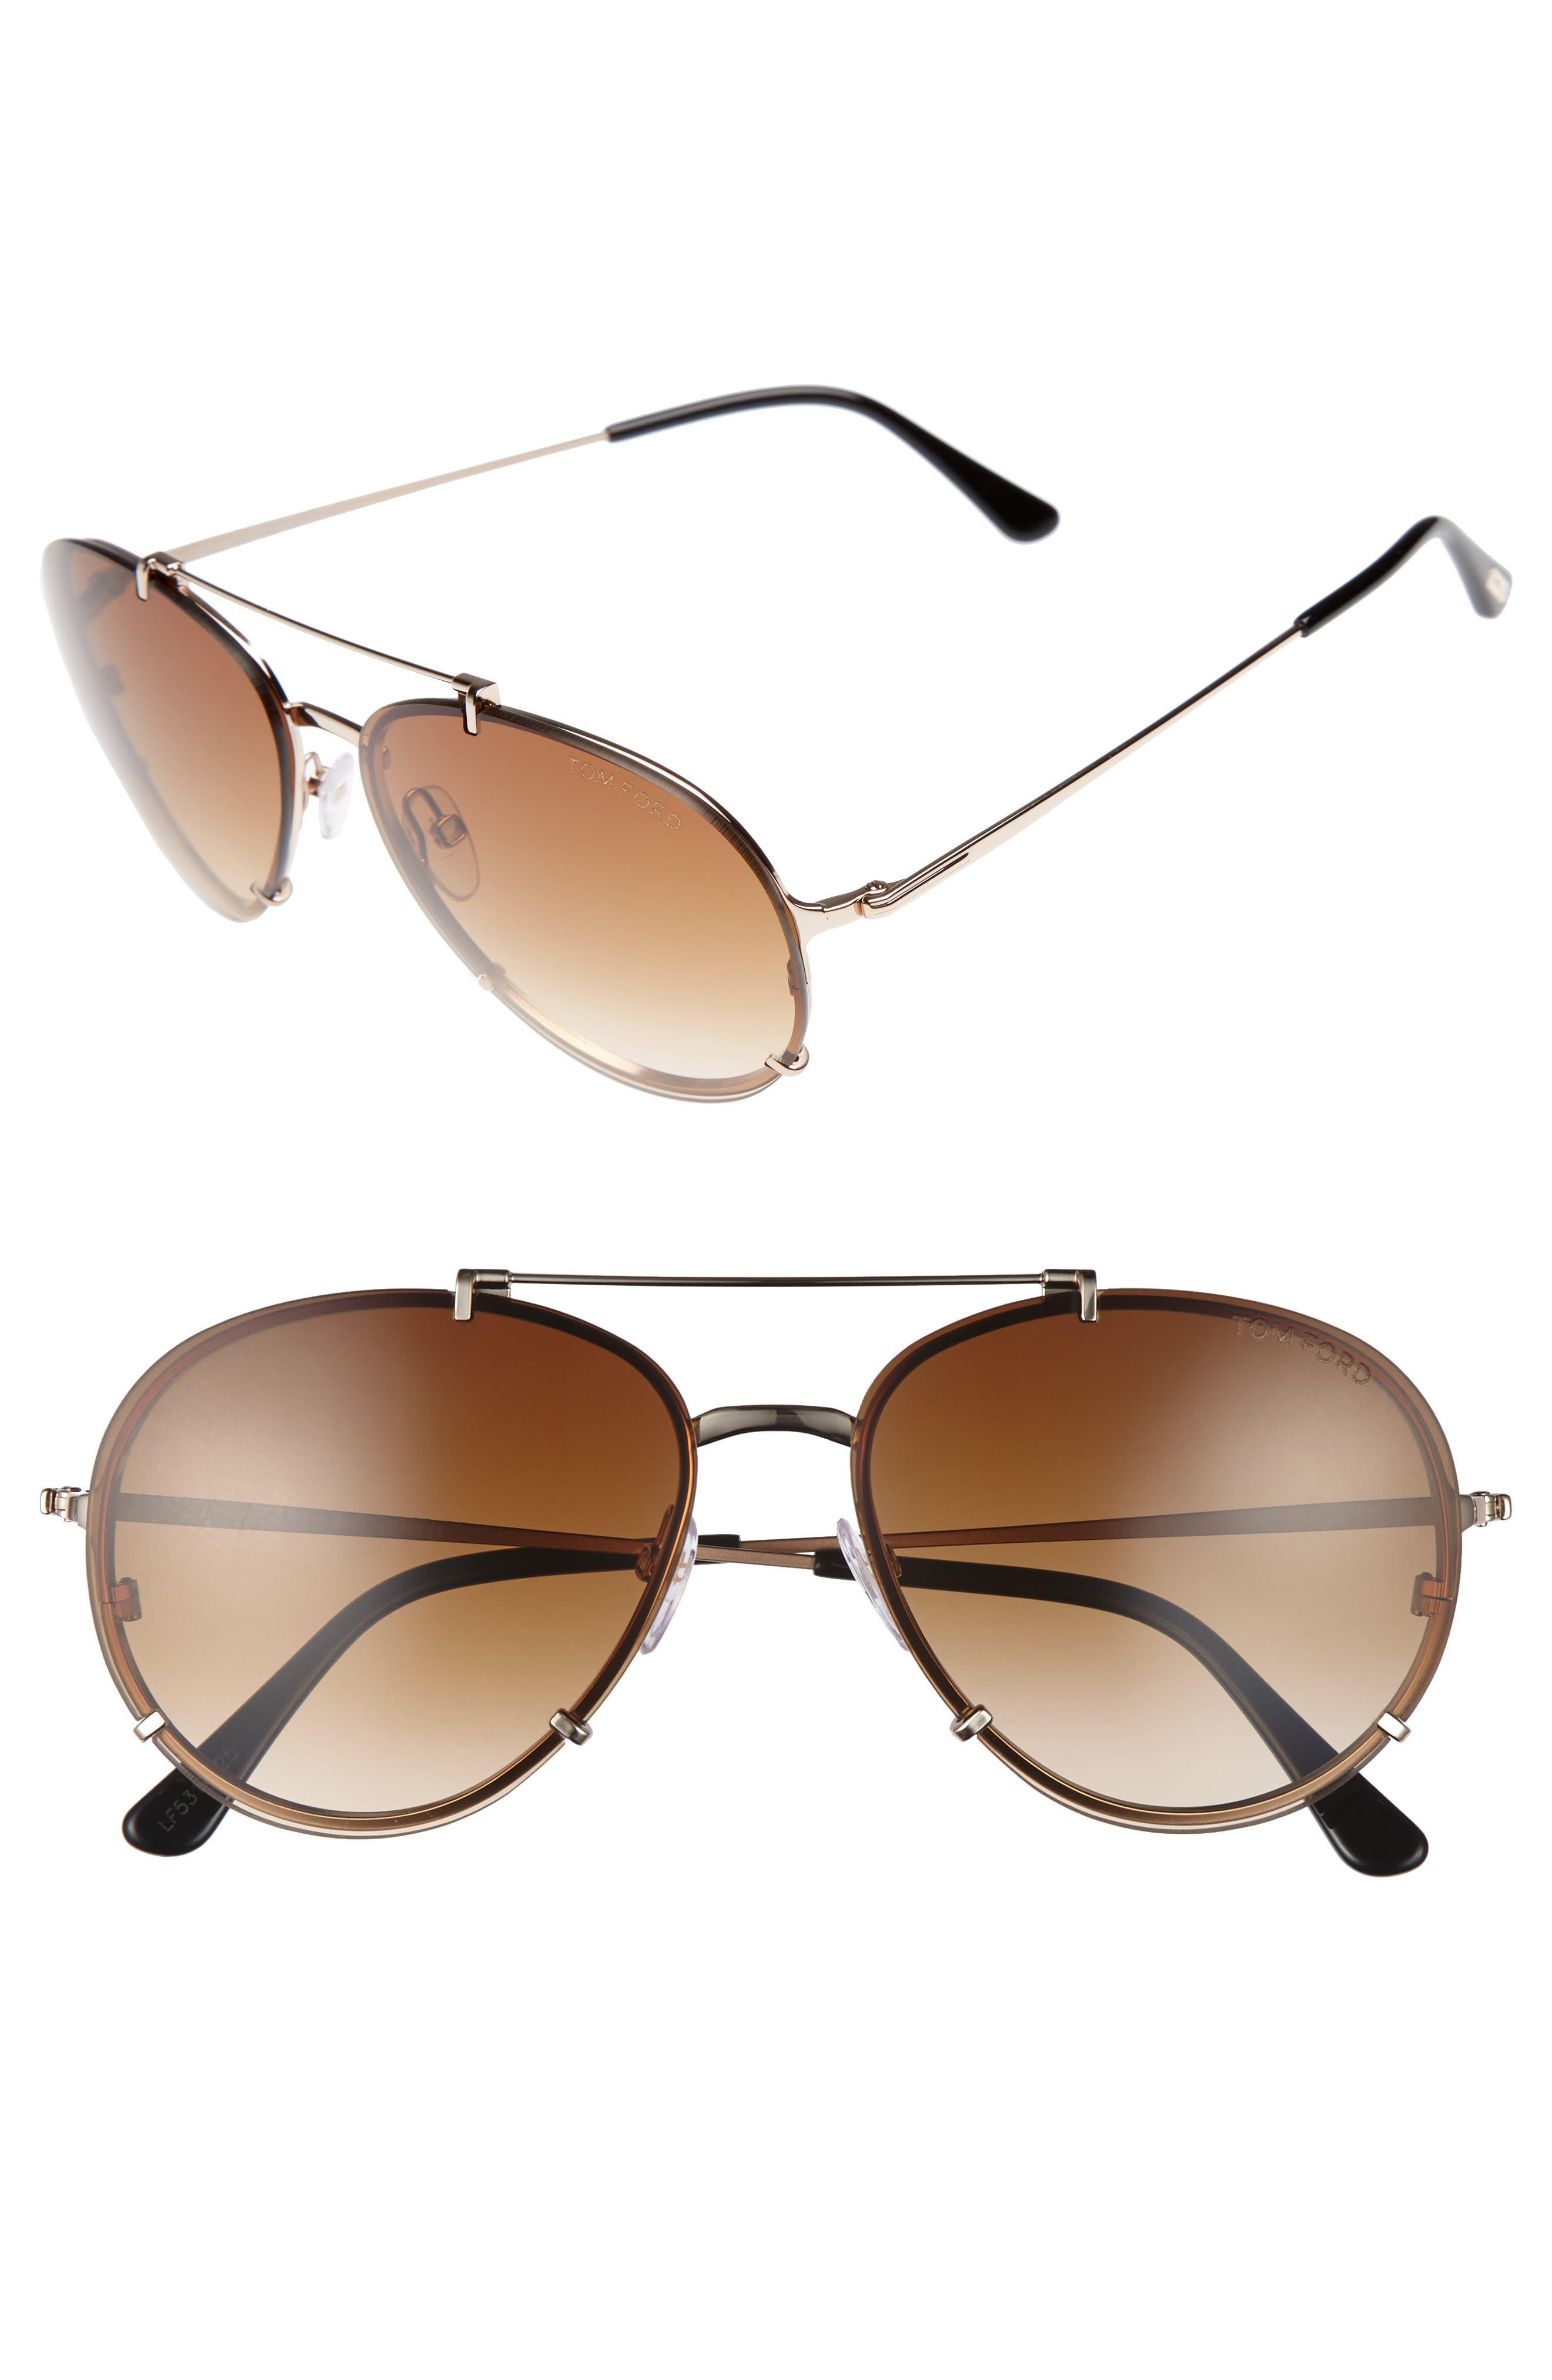 Dickon 59mm Aviator Sunglasses,                             Main thumbnail 1, color,                             710